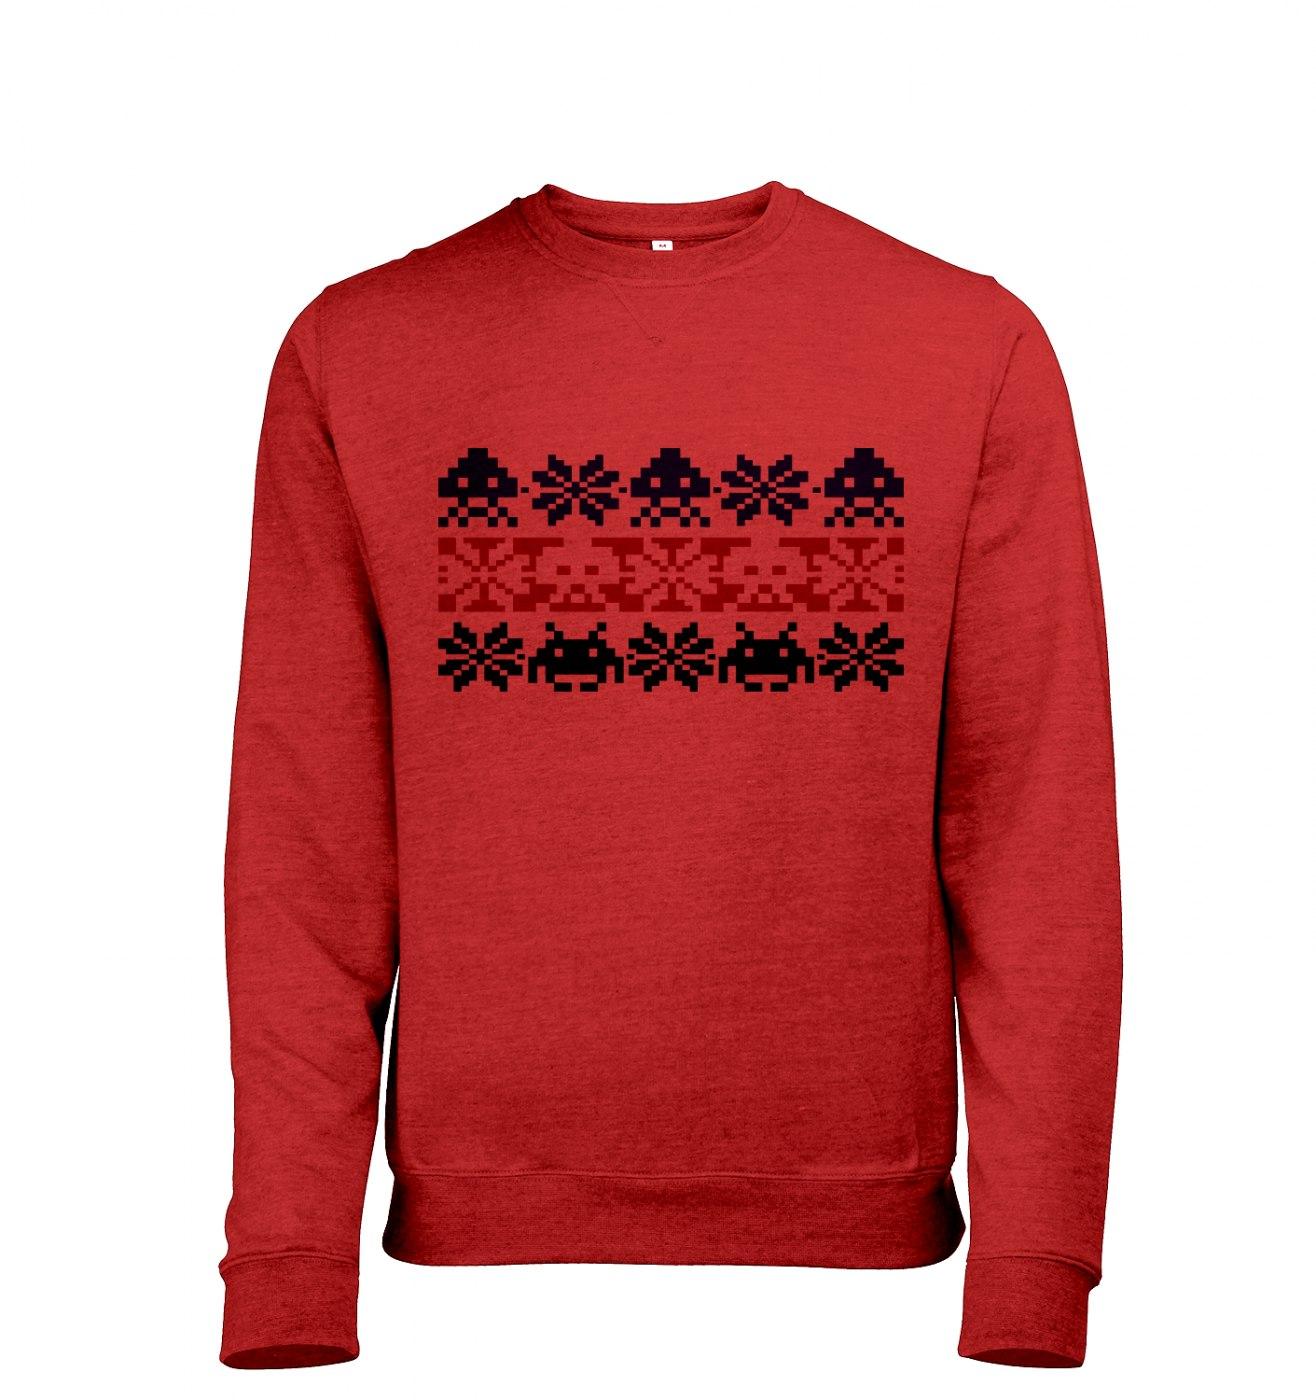 Isle Invaders men's heather sweatshirt